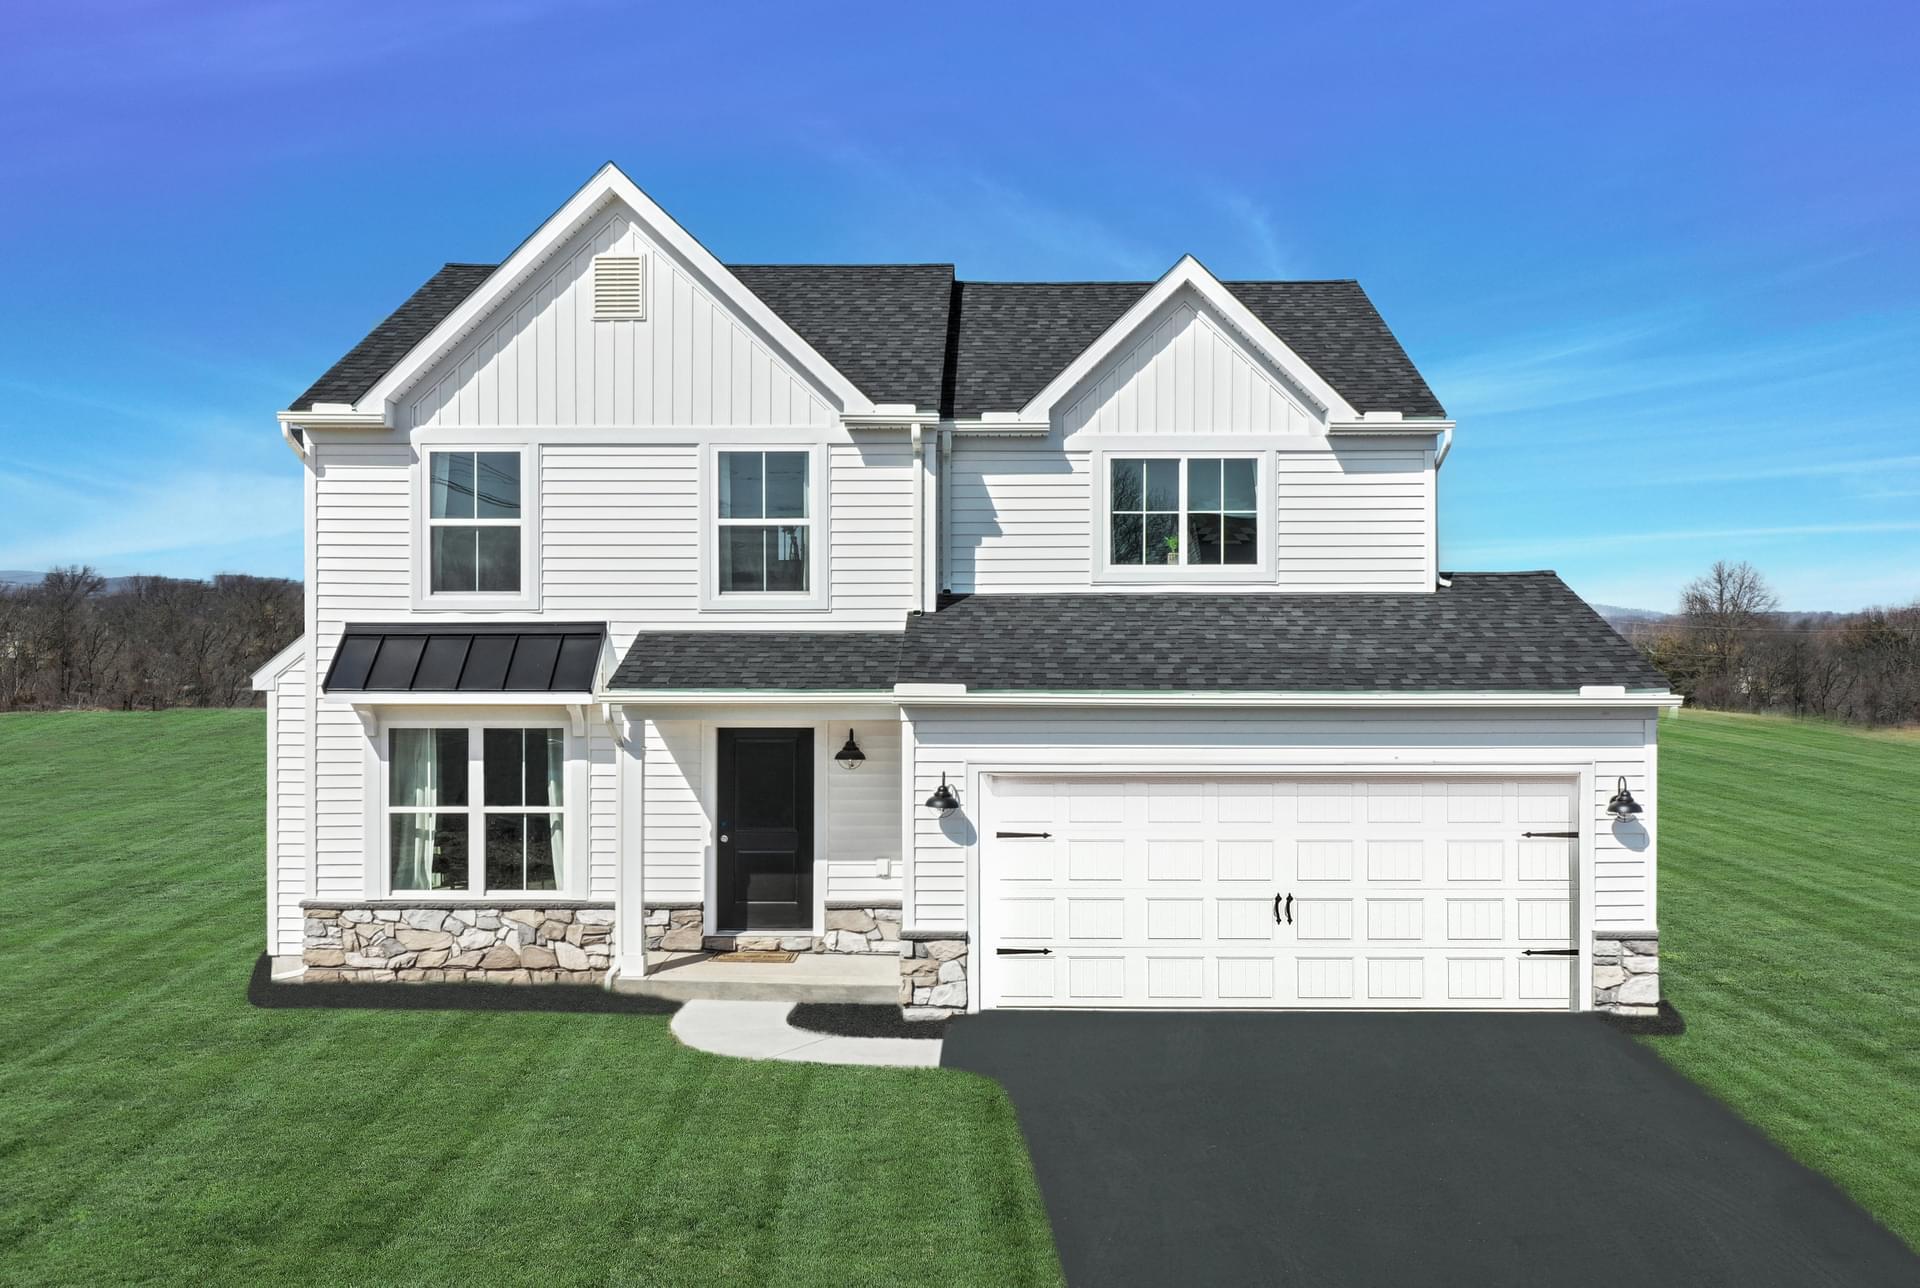 Rolling Meadows Singles New Homes in Pottstown, PA